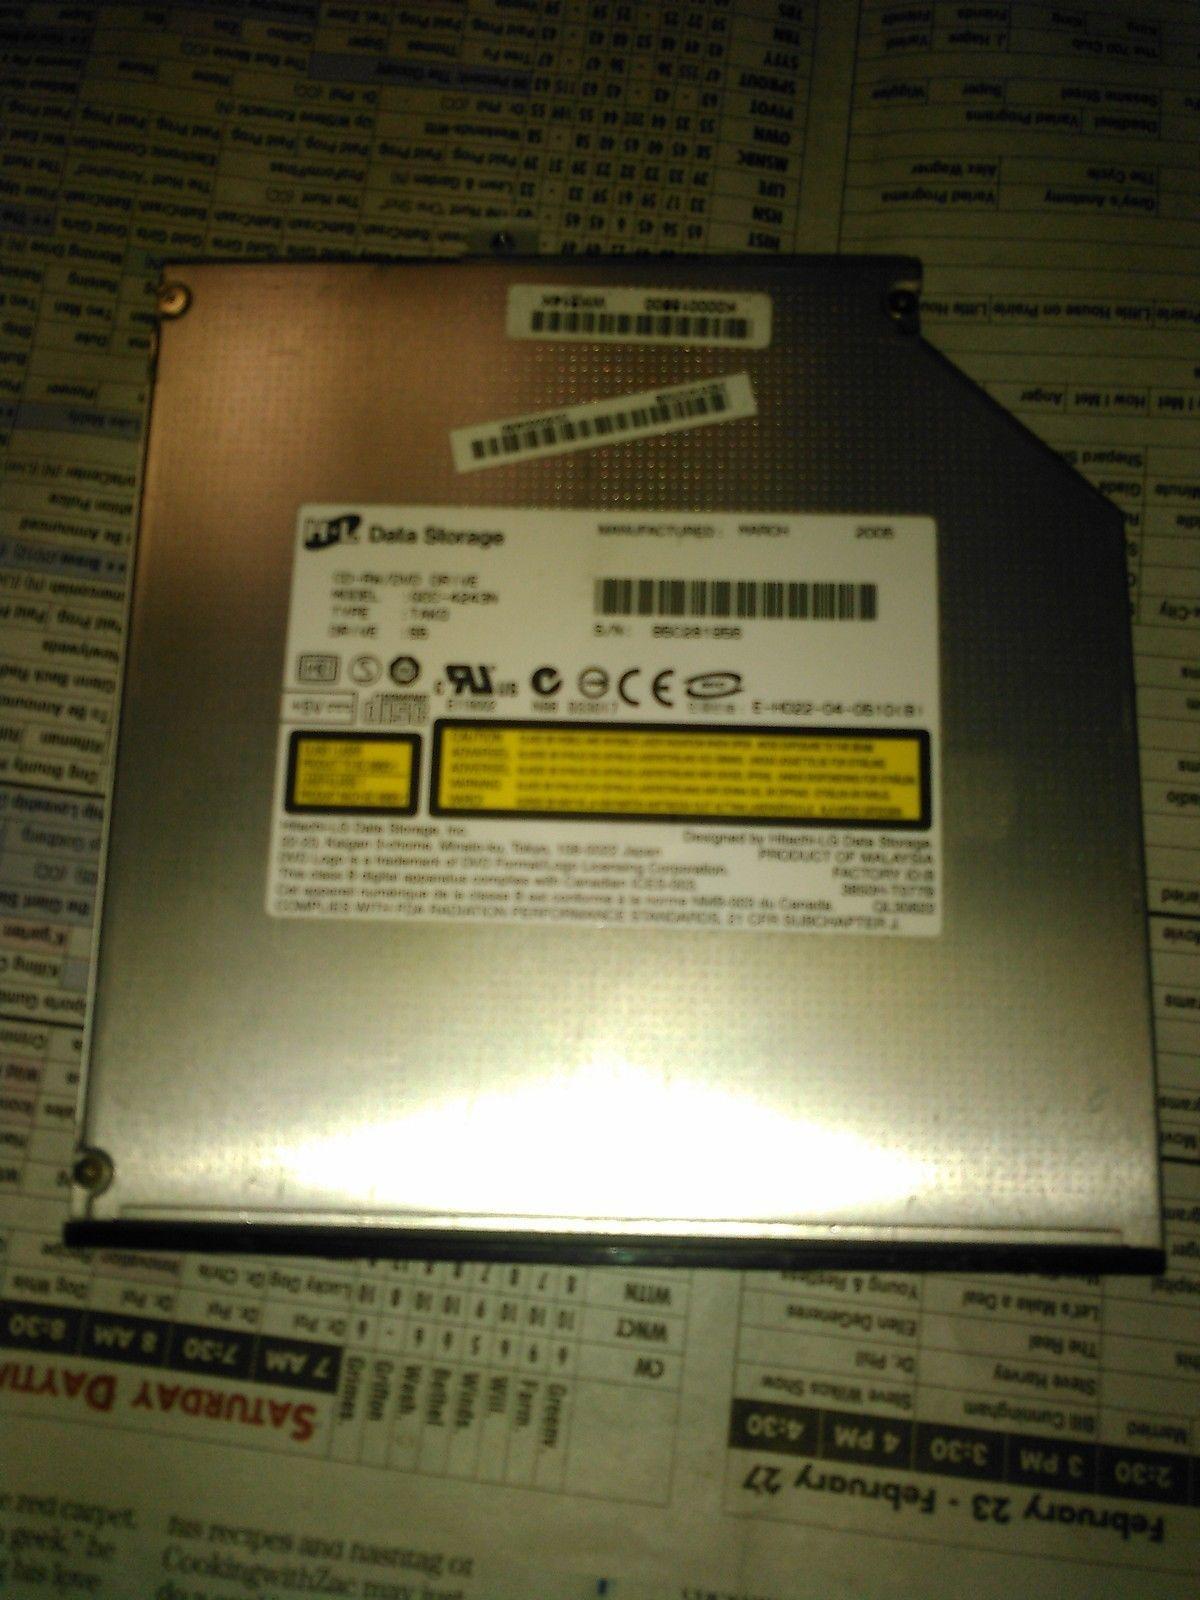 DVD CDRW DRIVE GCC-4243N WINDOWS XP DRIVER